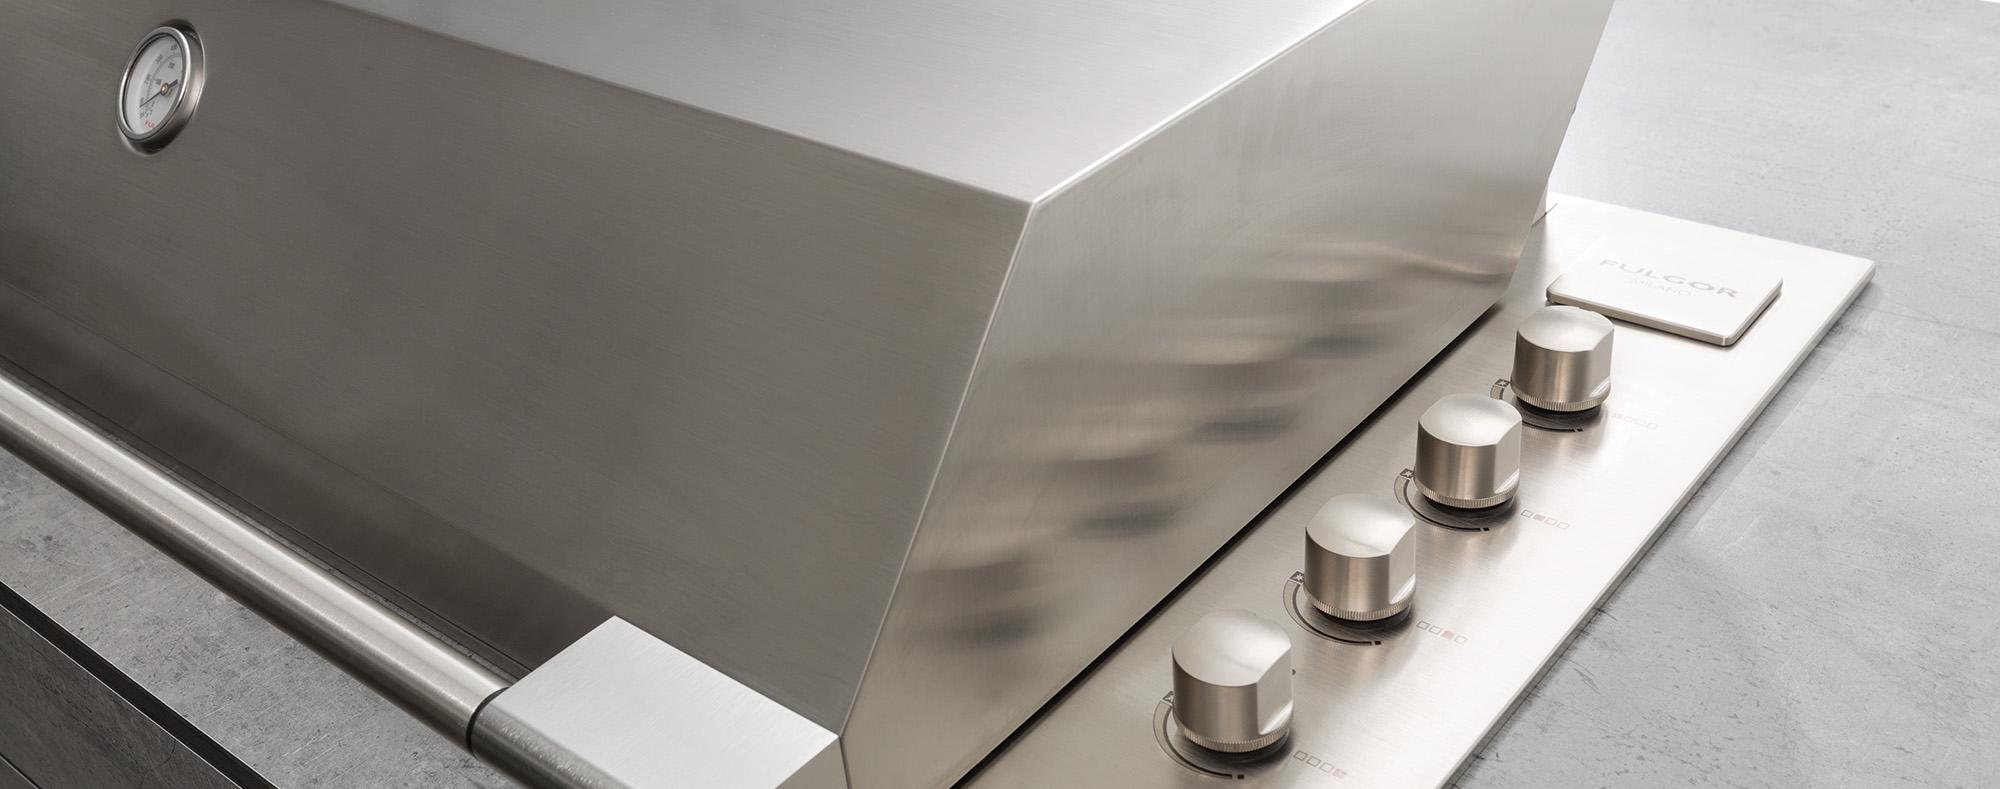 Luxury Outdoor Kitchen Design Ideas